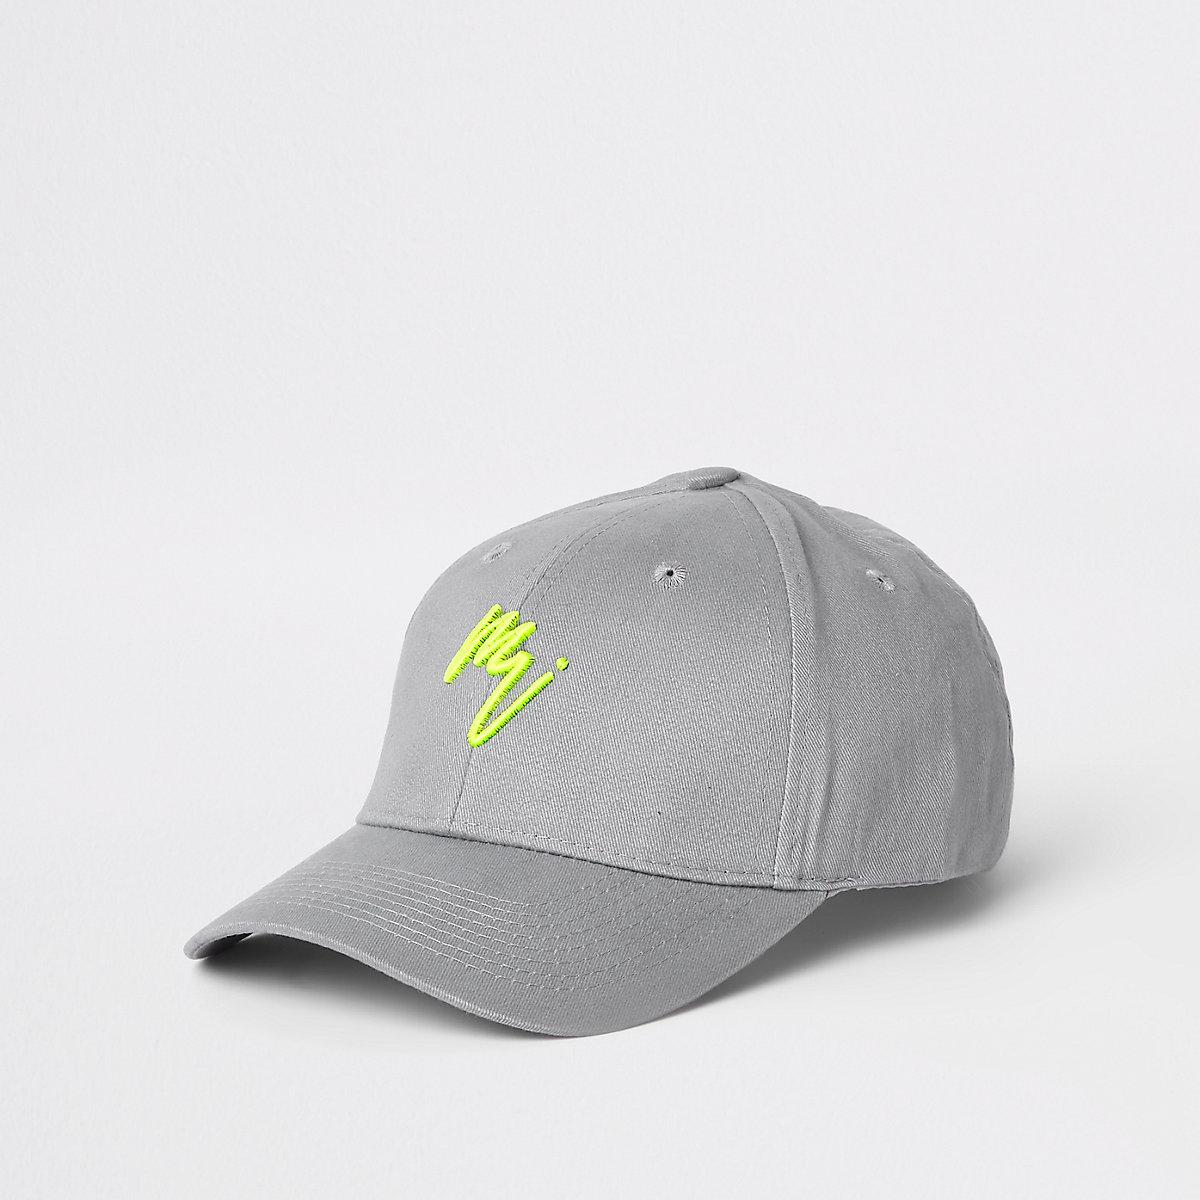 Grey 'Maison Riviera' neon baseball cap